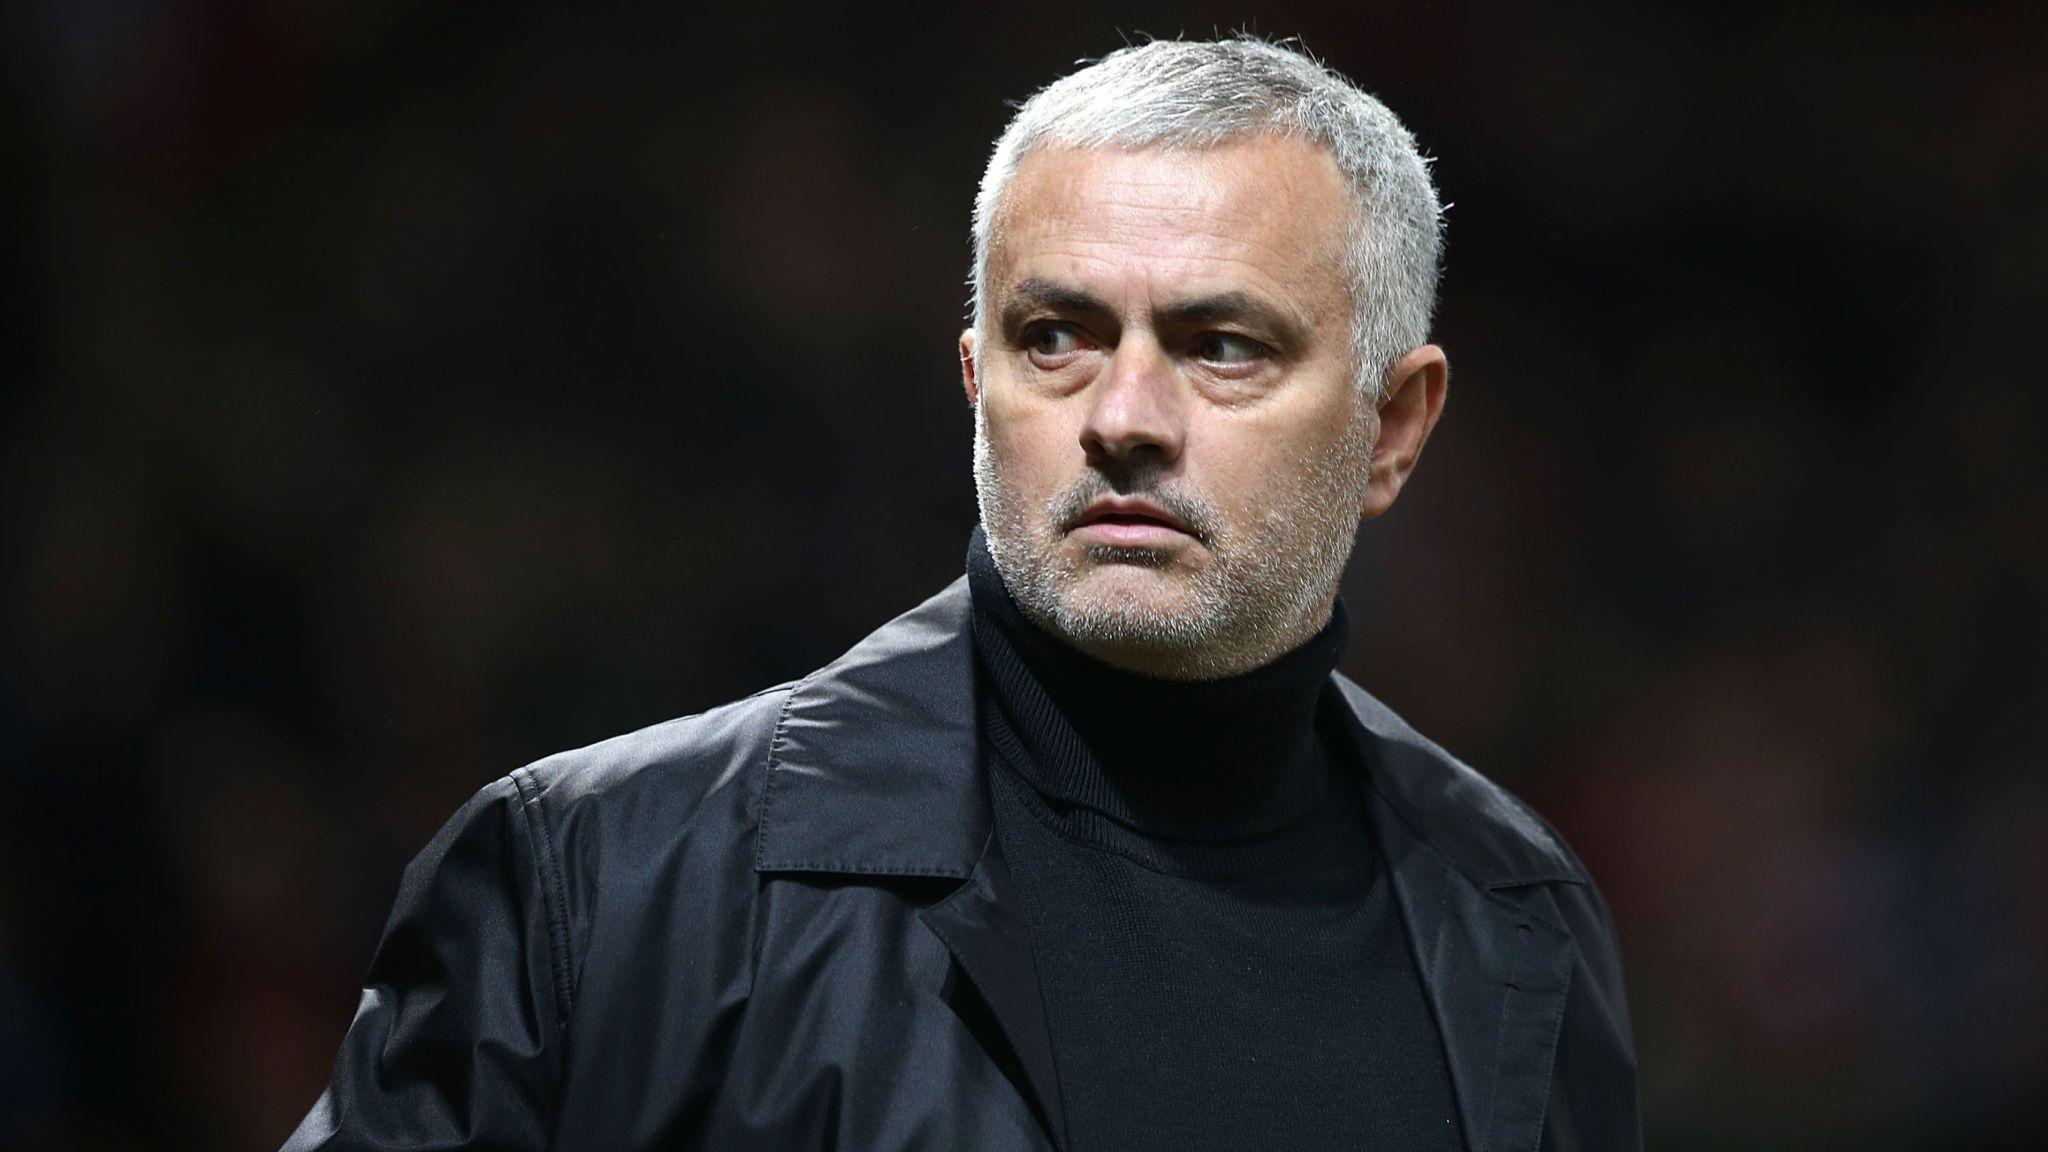 Jose Mourinho Tak Diinginkan Oleh Real Madrid